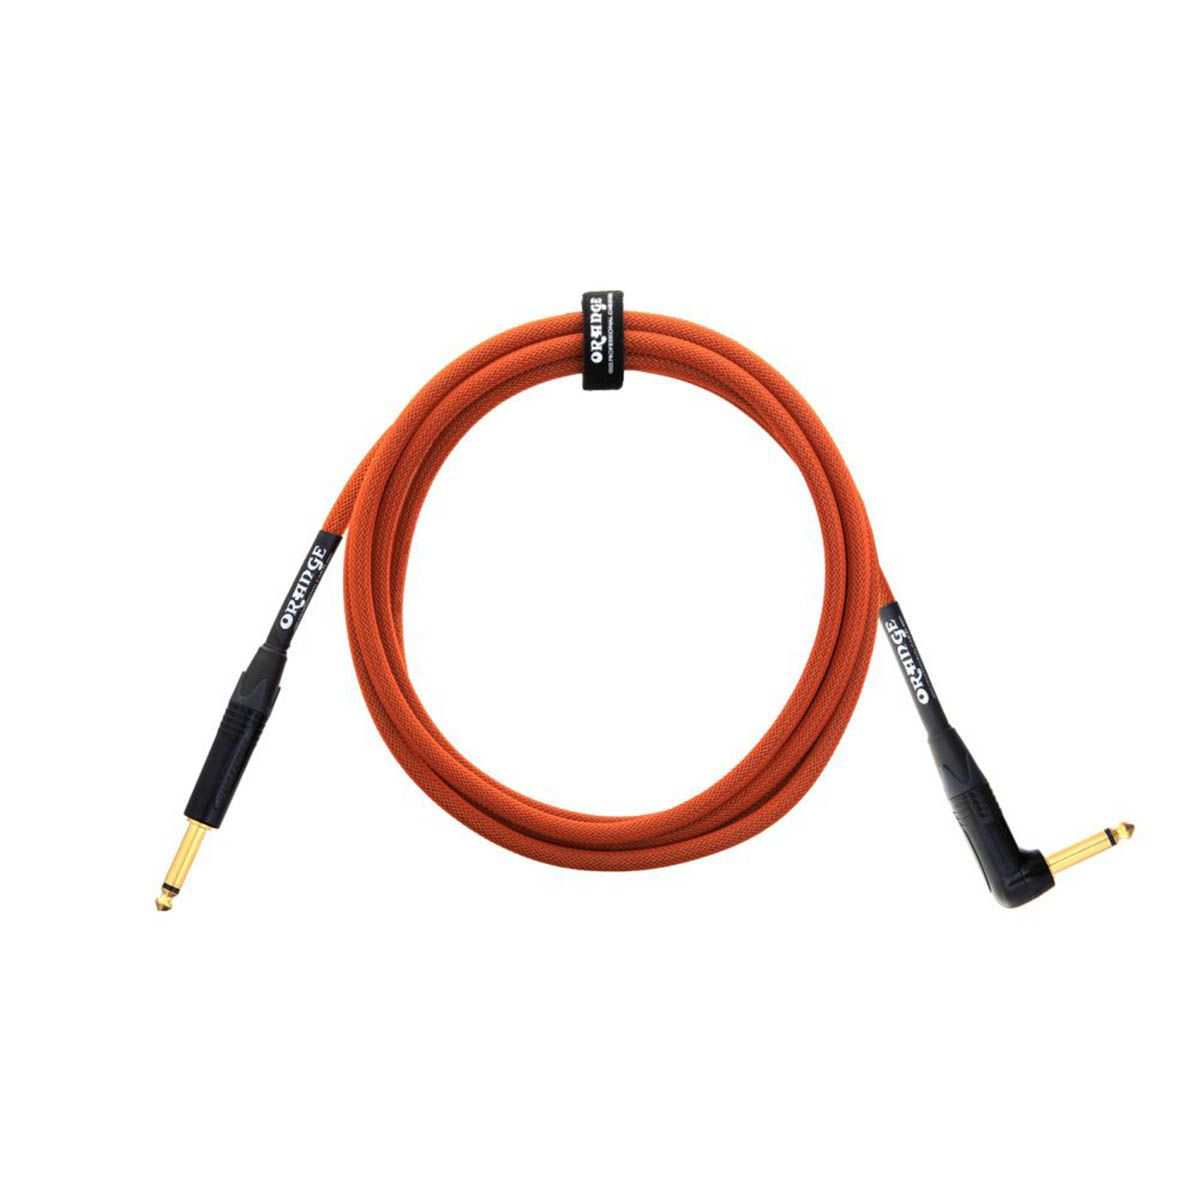 Cabo Orange ANGLED 3,05M P10 para Instrumentos